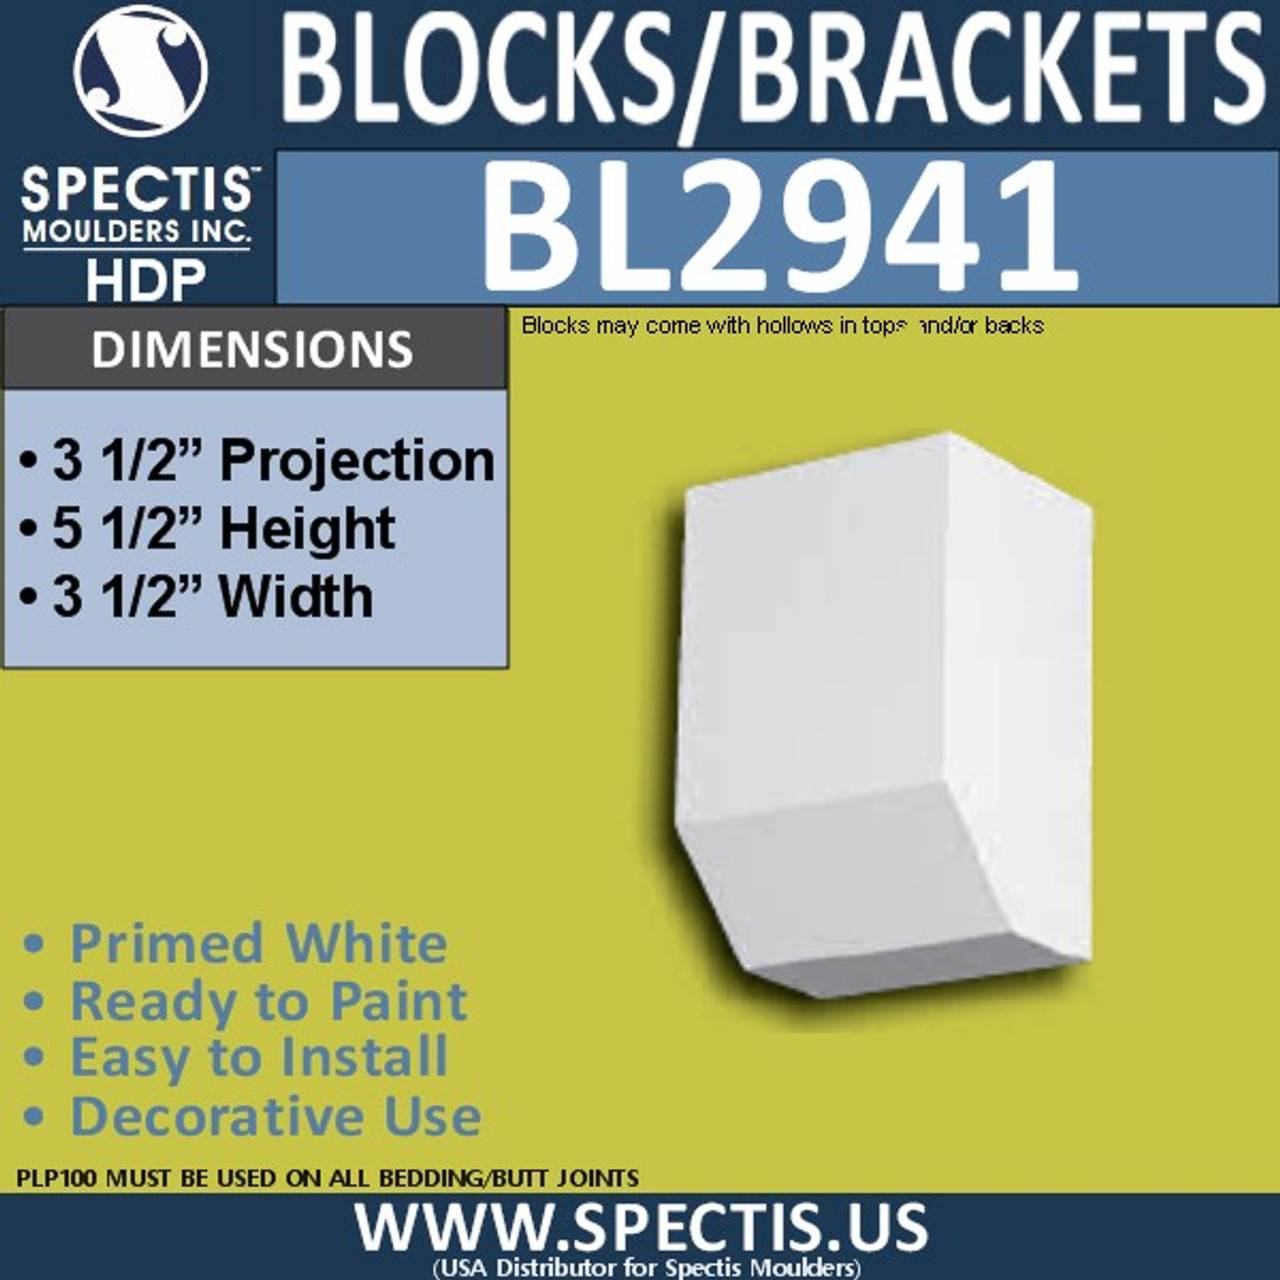 "BL2941 Eave Block or Bracket 3.5""W x 5.5""H x 3.5"" P"